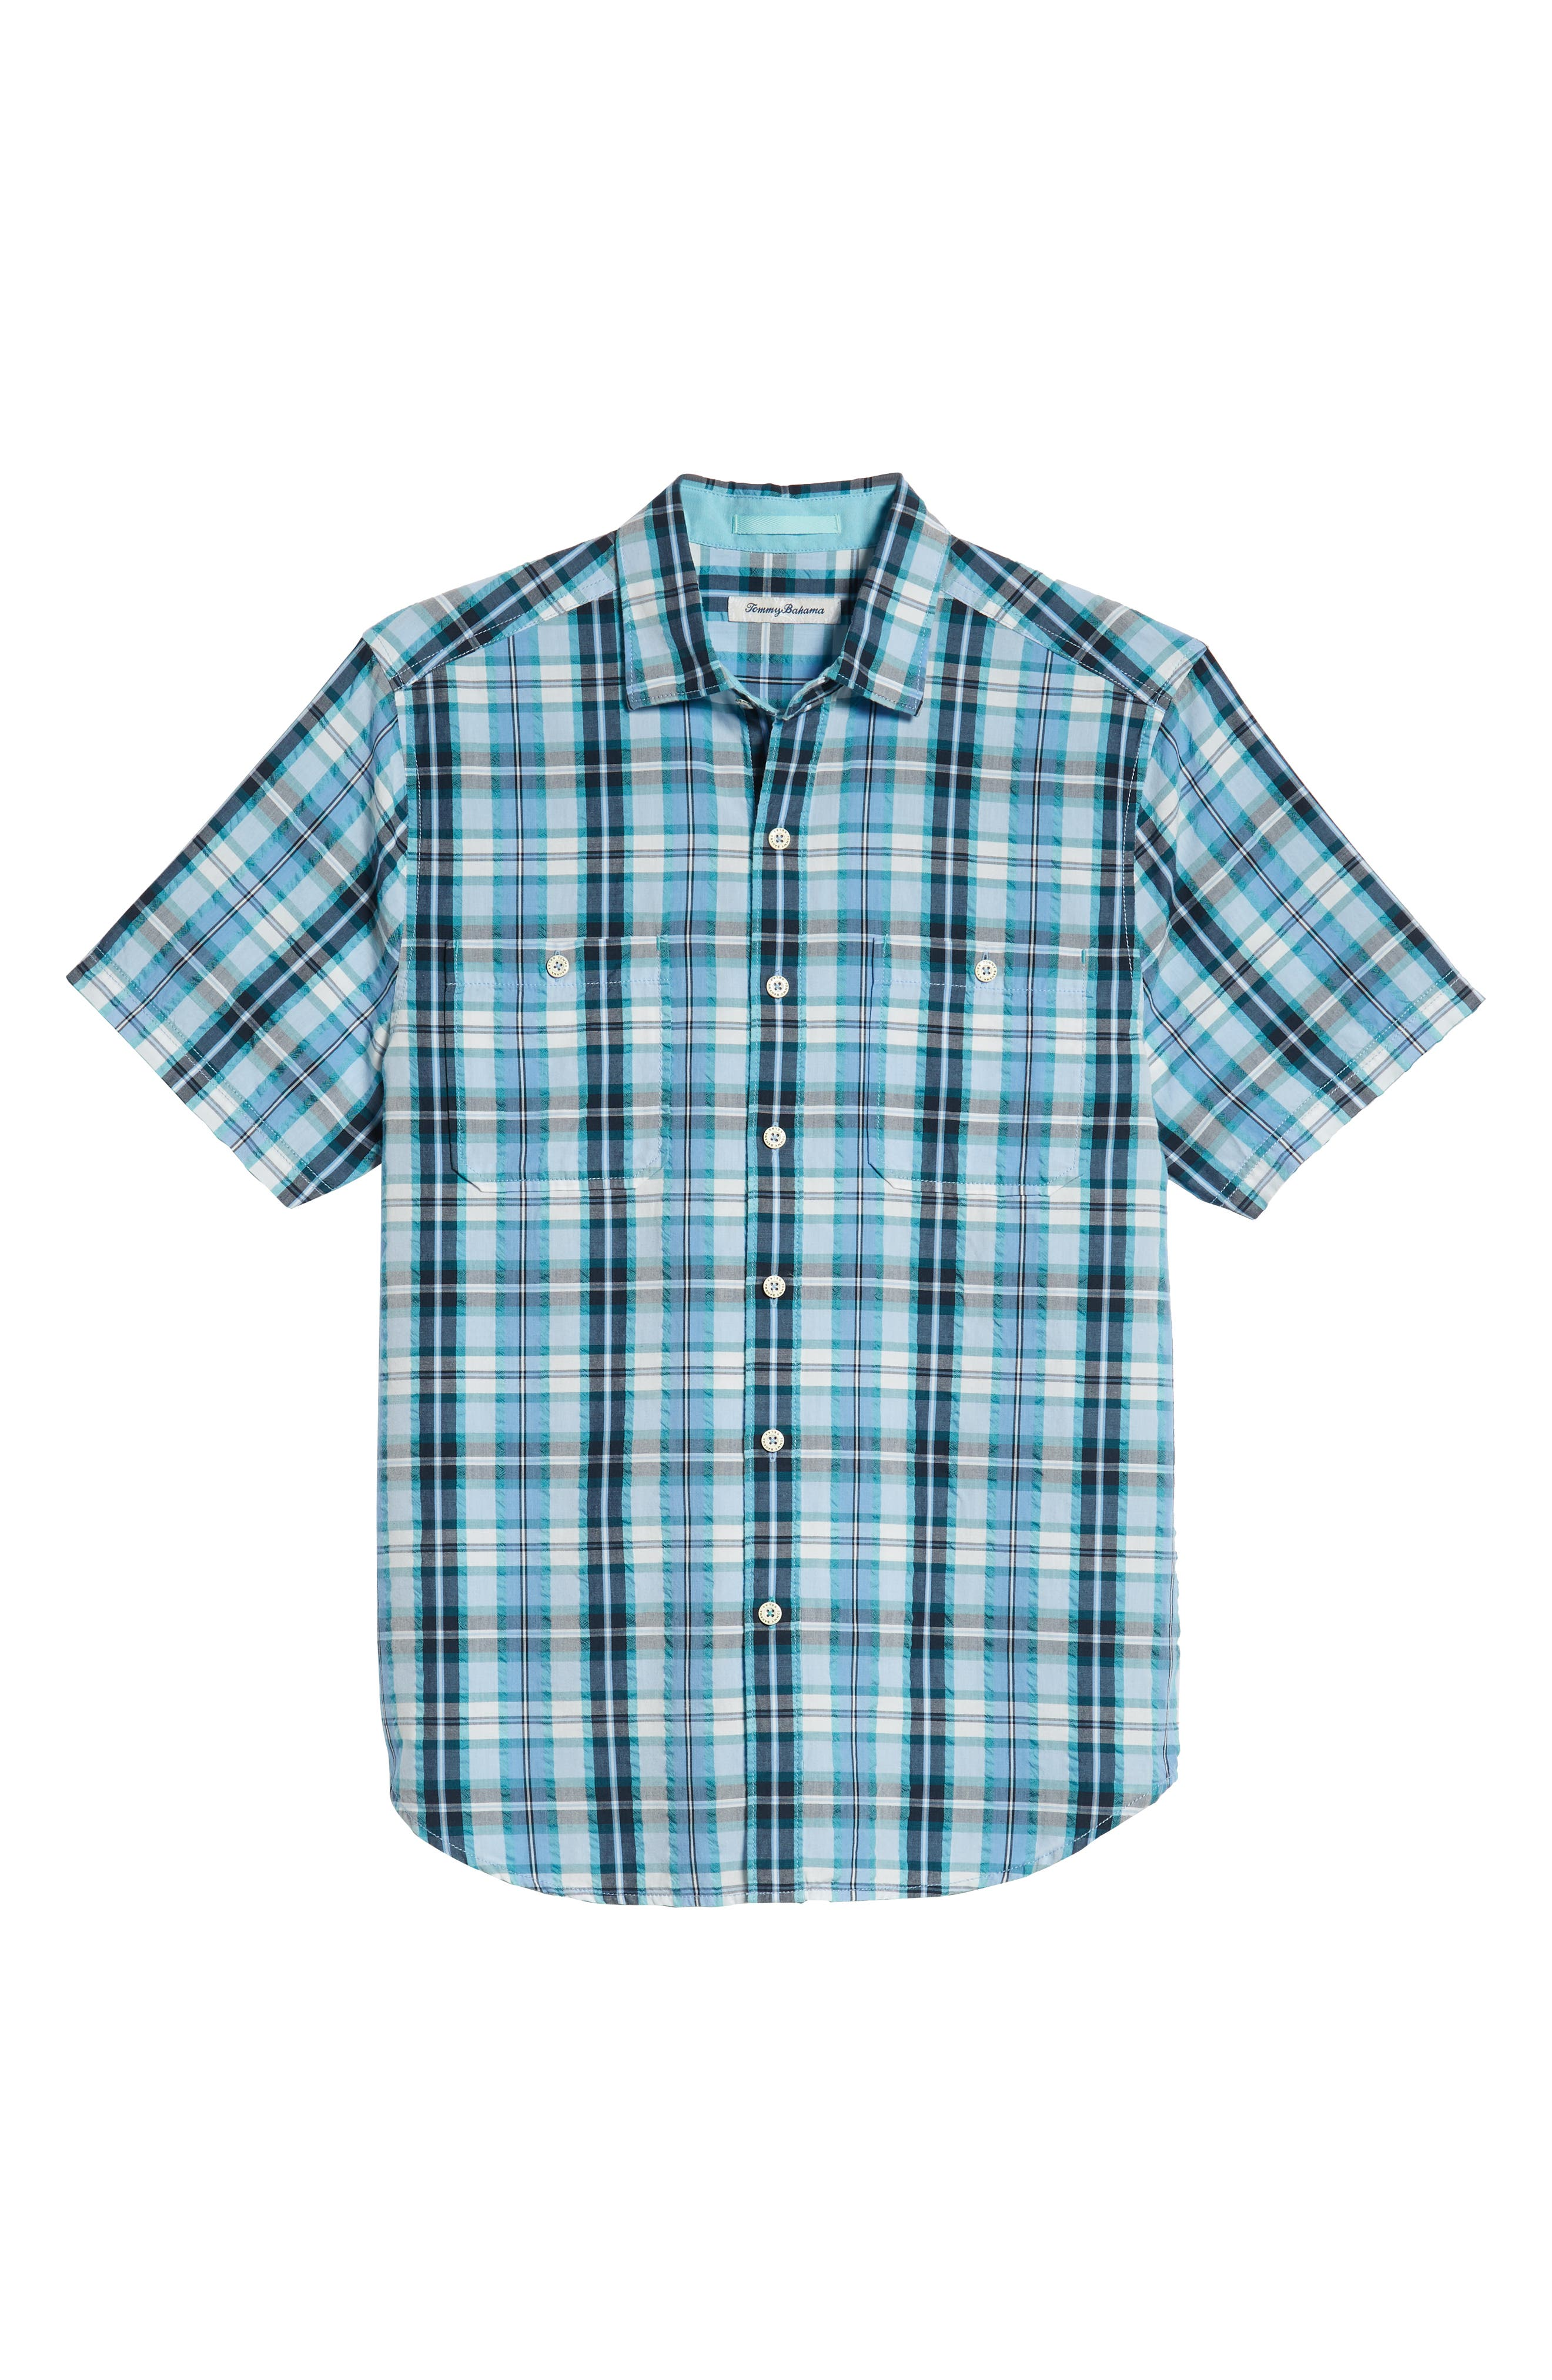 Papagayo Plaid Sport Shirt,                             Alternate thumbnail 5, color,                             RIVIERA AZURE